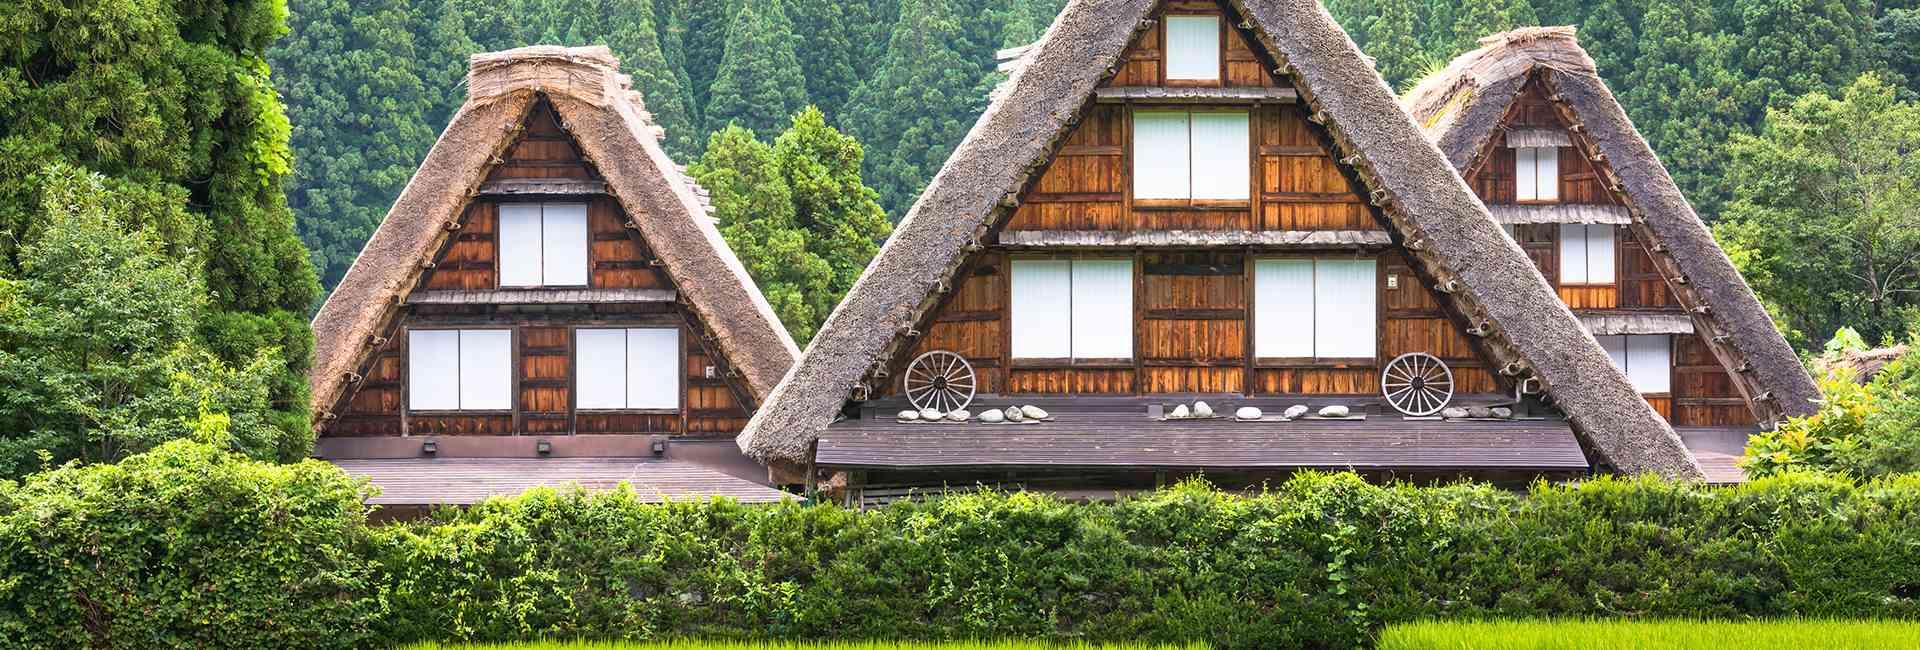 ase tradizionali a Shirakawa-go